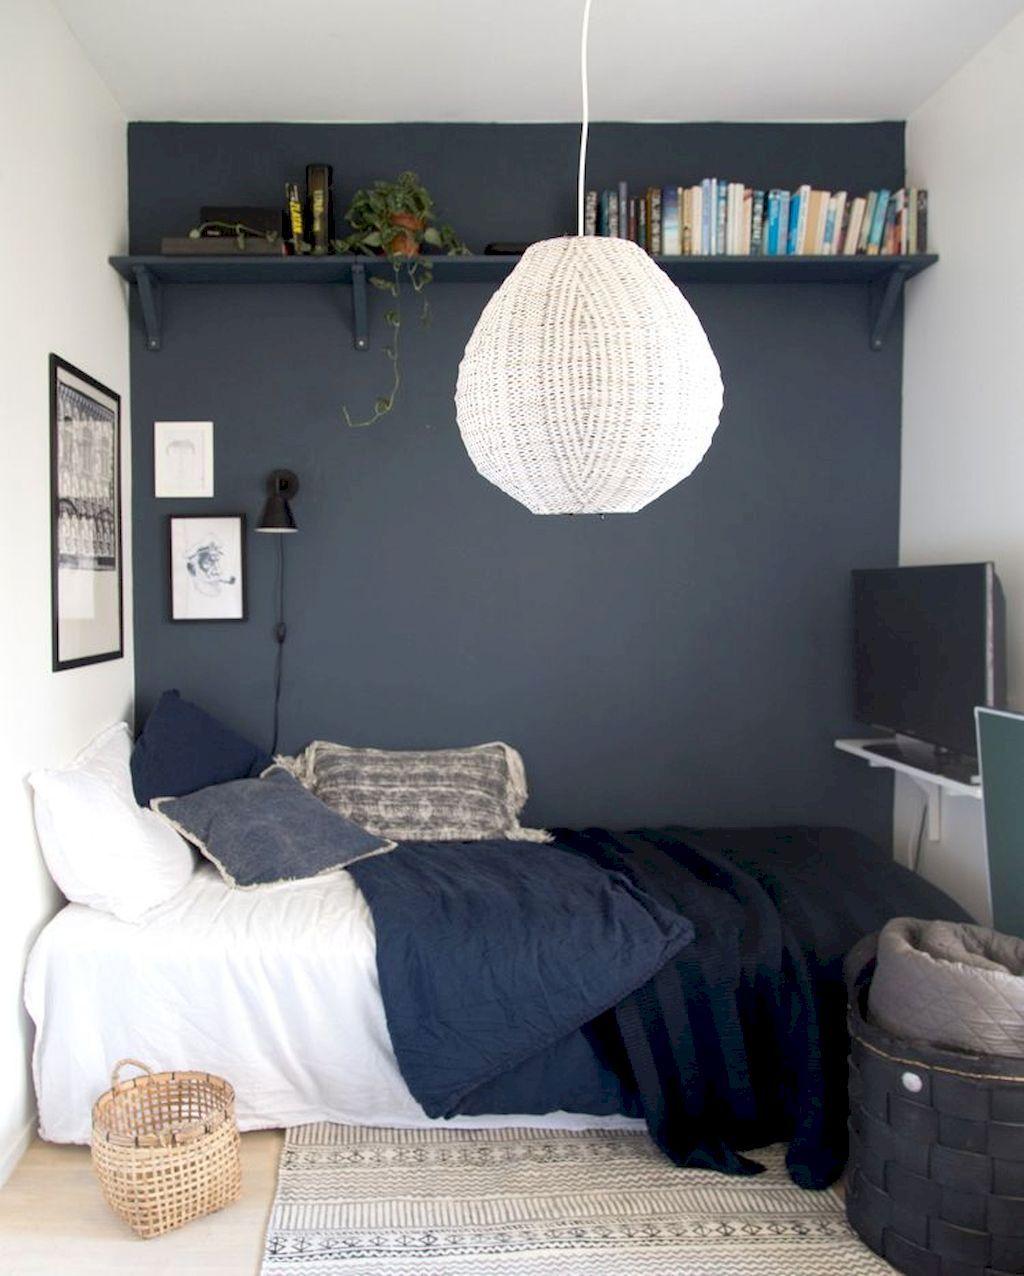 Small Cozy Bedroom Design Ideas Apartment Therapy Small Room Bedroom Small Bedroom Designs Small Room Design